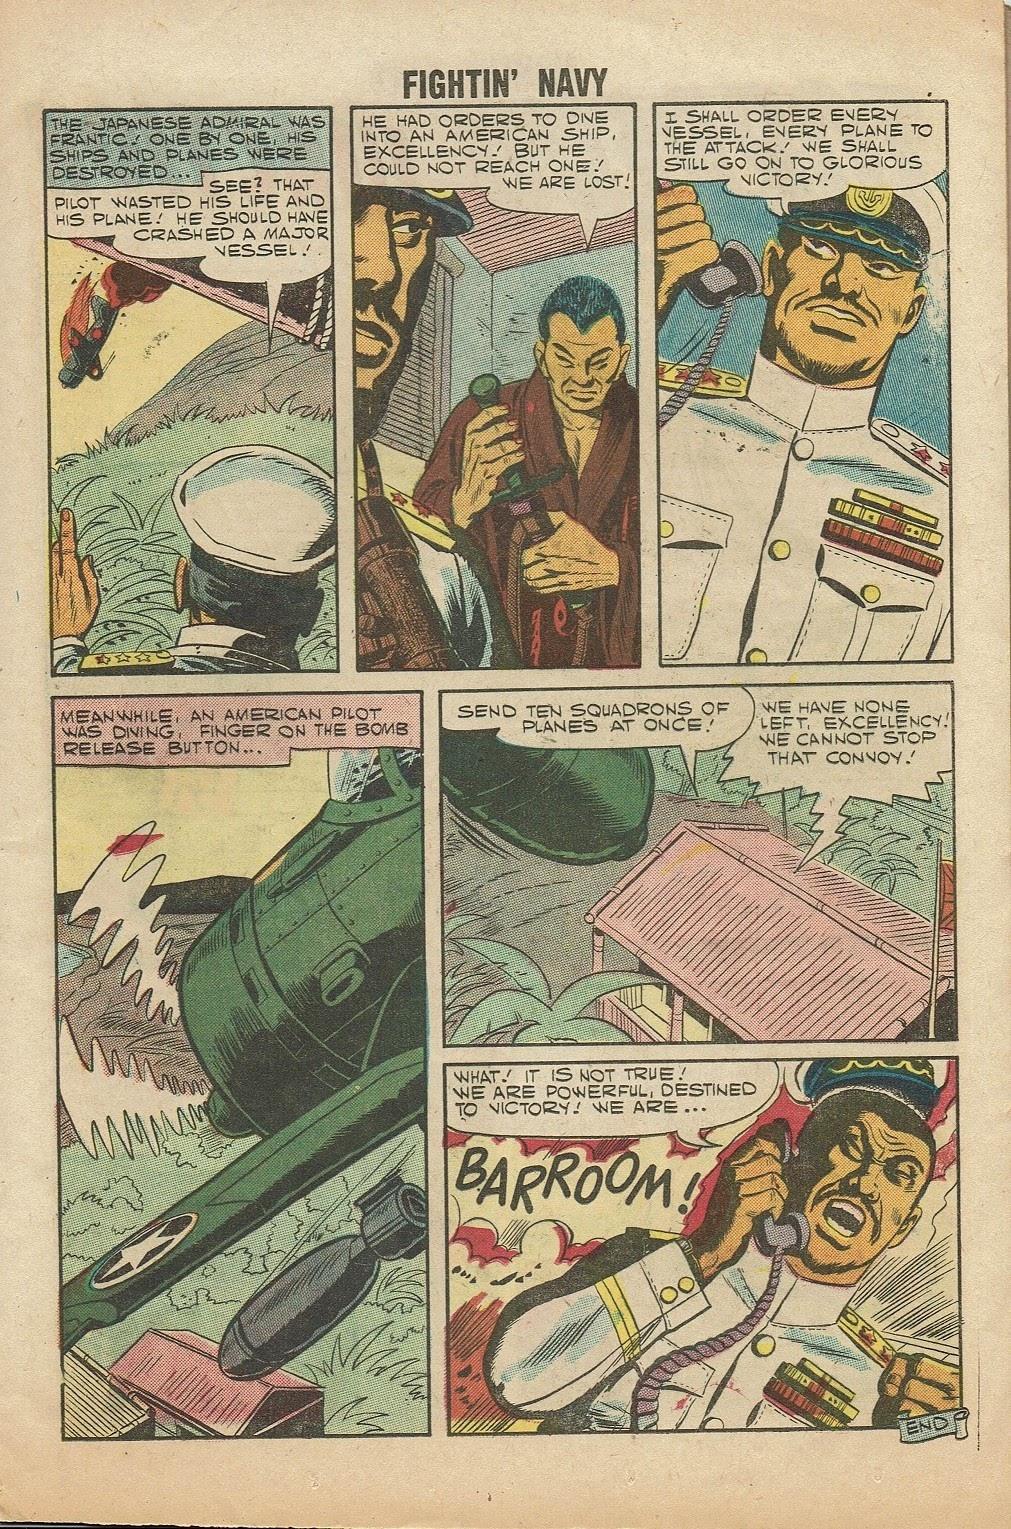 Read online Fightin' Navy comic -  Issue #81 - 13